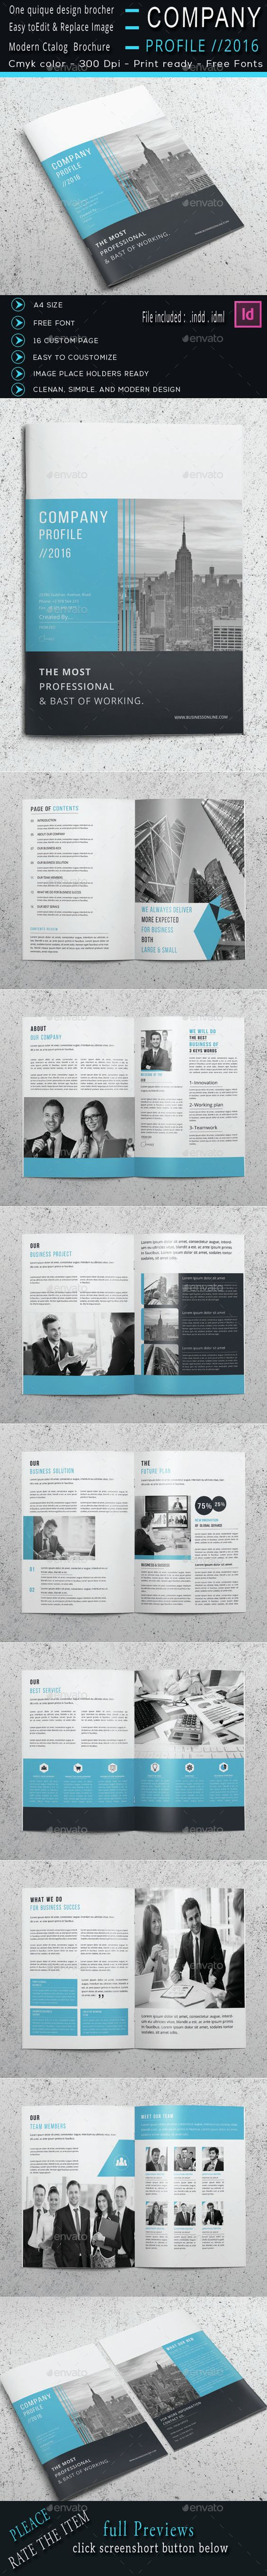 The Company Profile  Templates Company Profile And The OJays